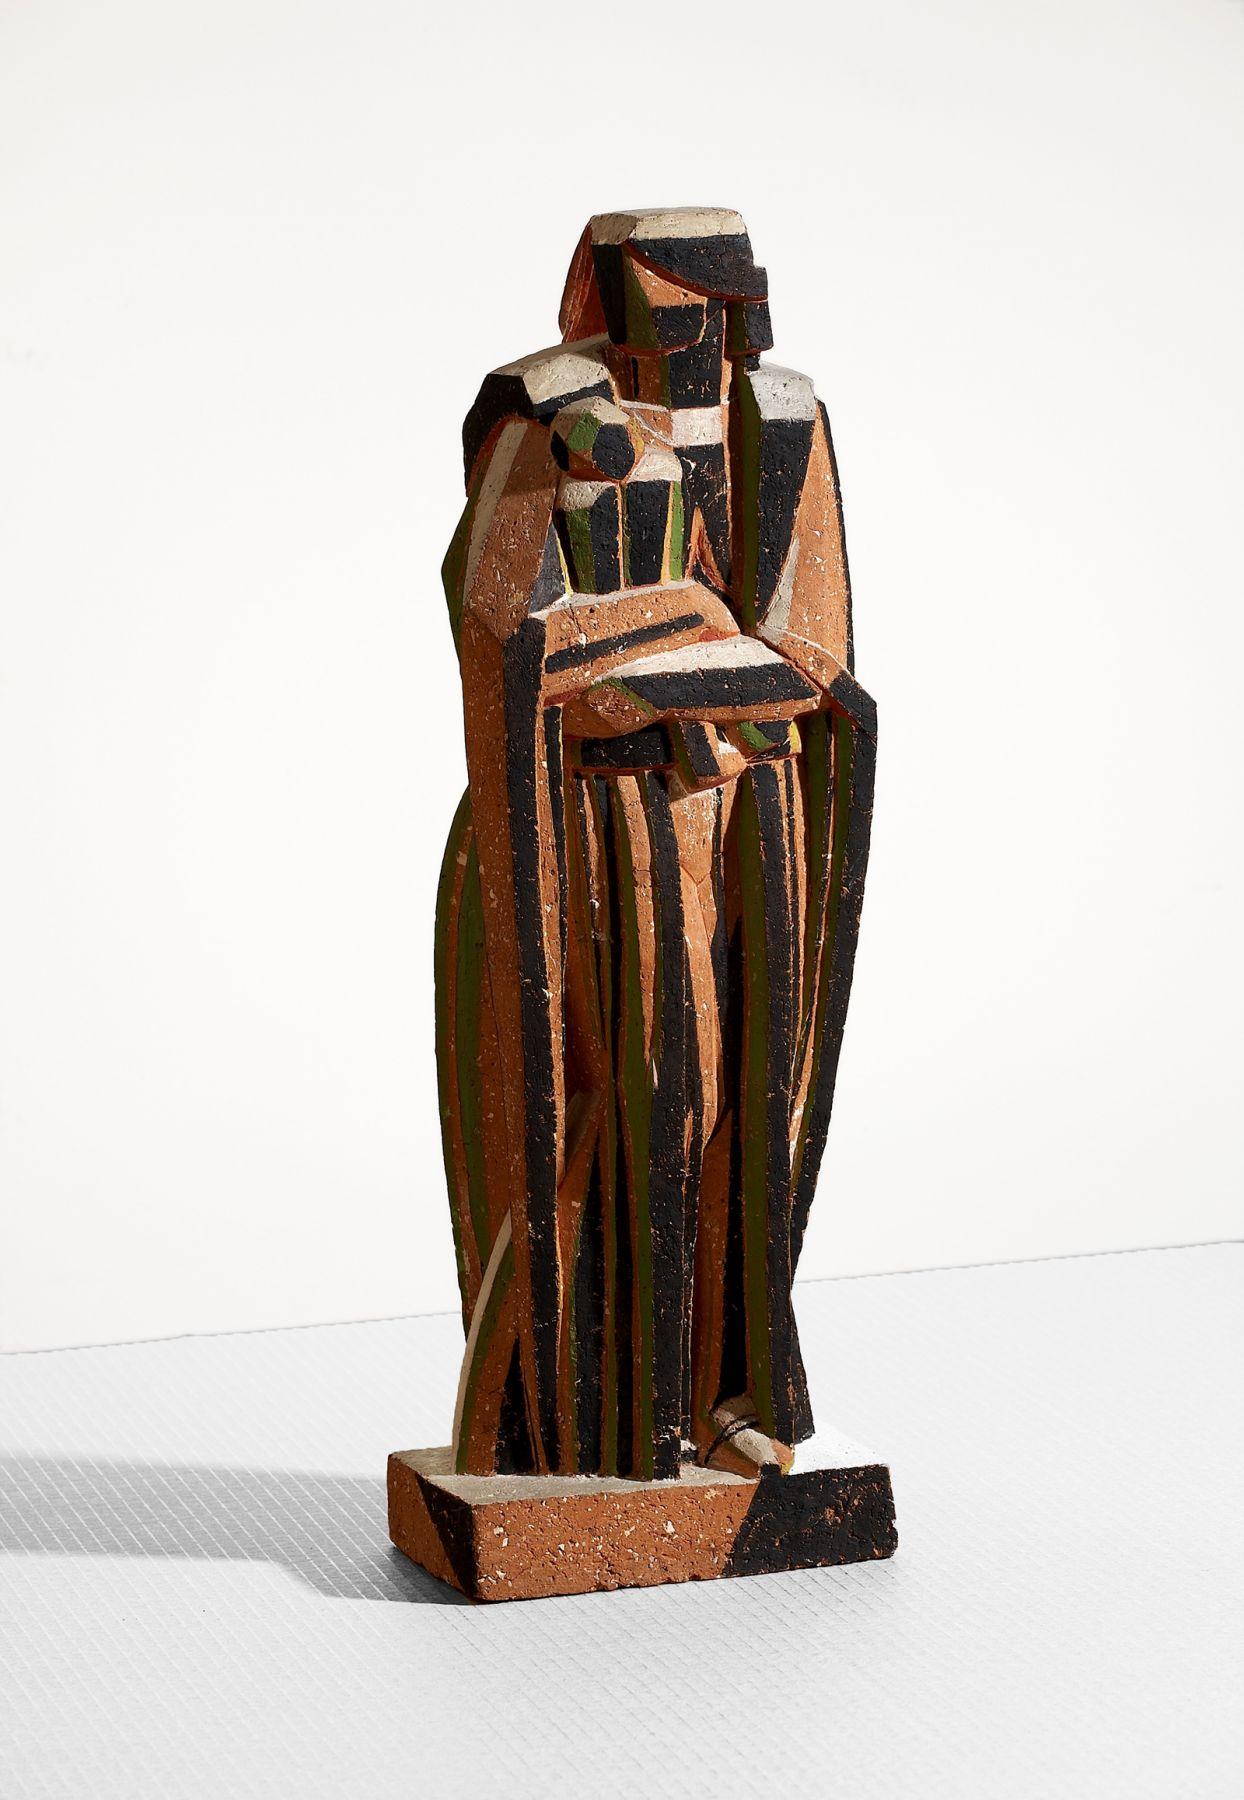 John Storrs, Modern Madonna, c. 1918, polychromed cast stone, 23 h x 7 1/2 w x 5 d inches, unique